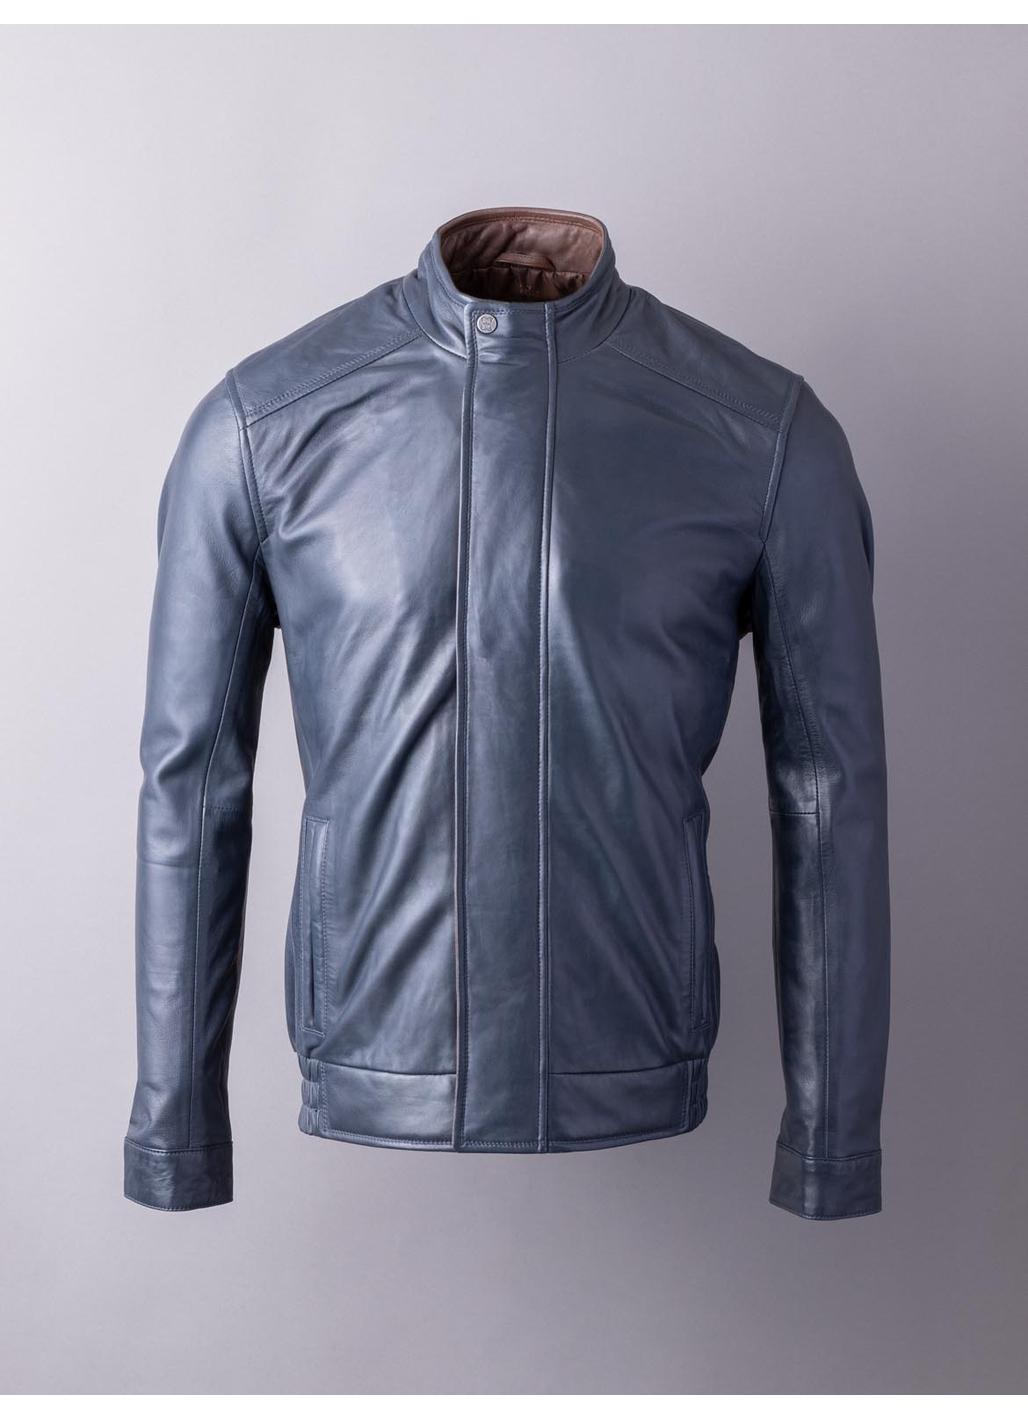 Swinside Leather Bomber Jacket in Navy